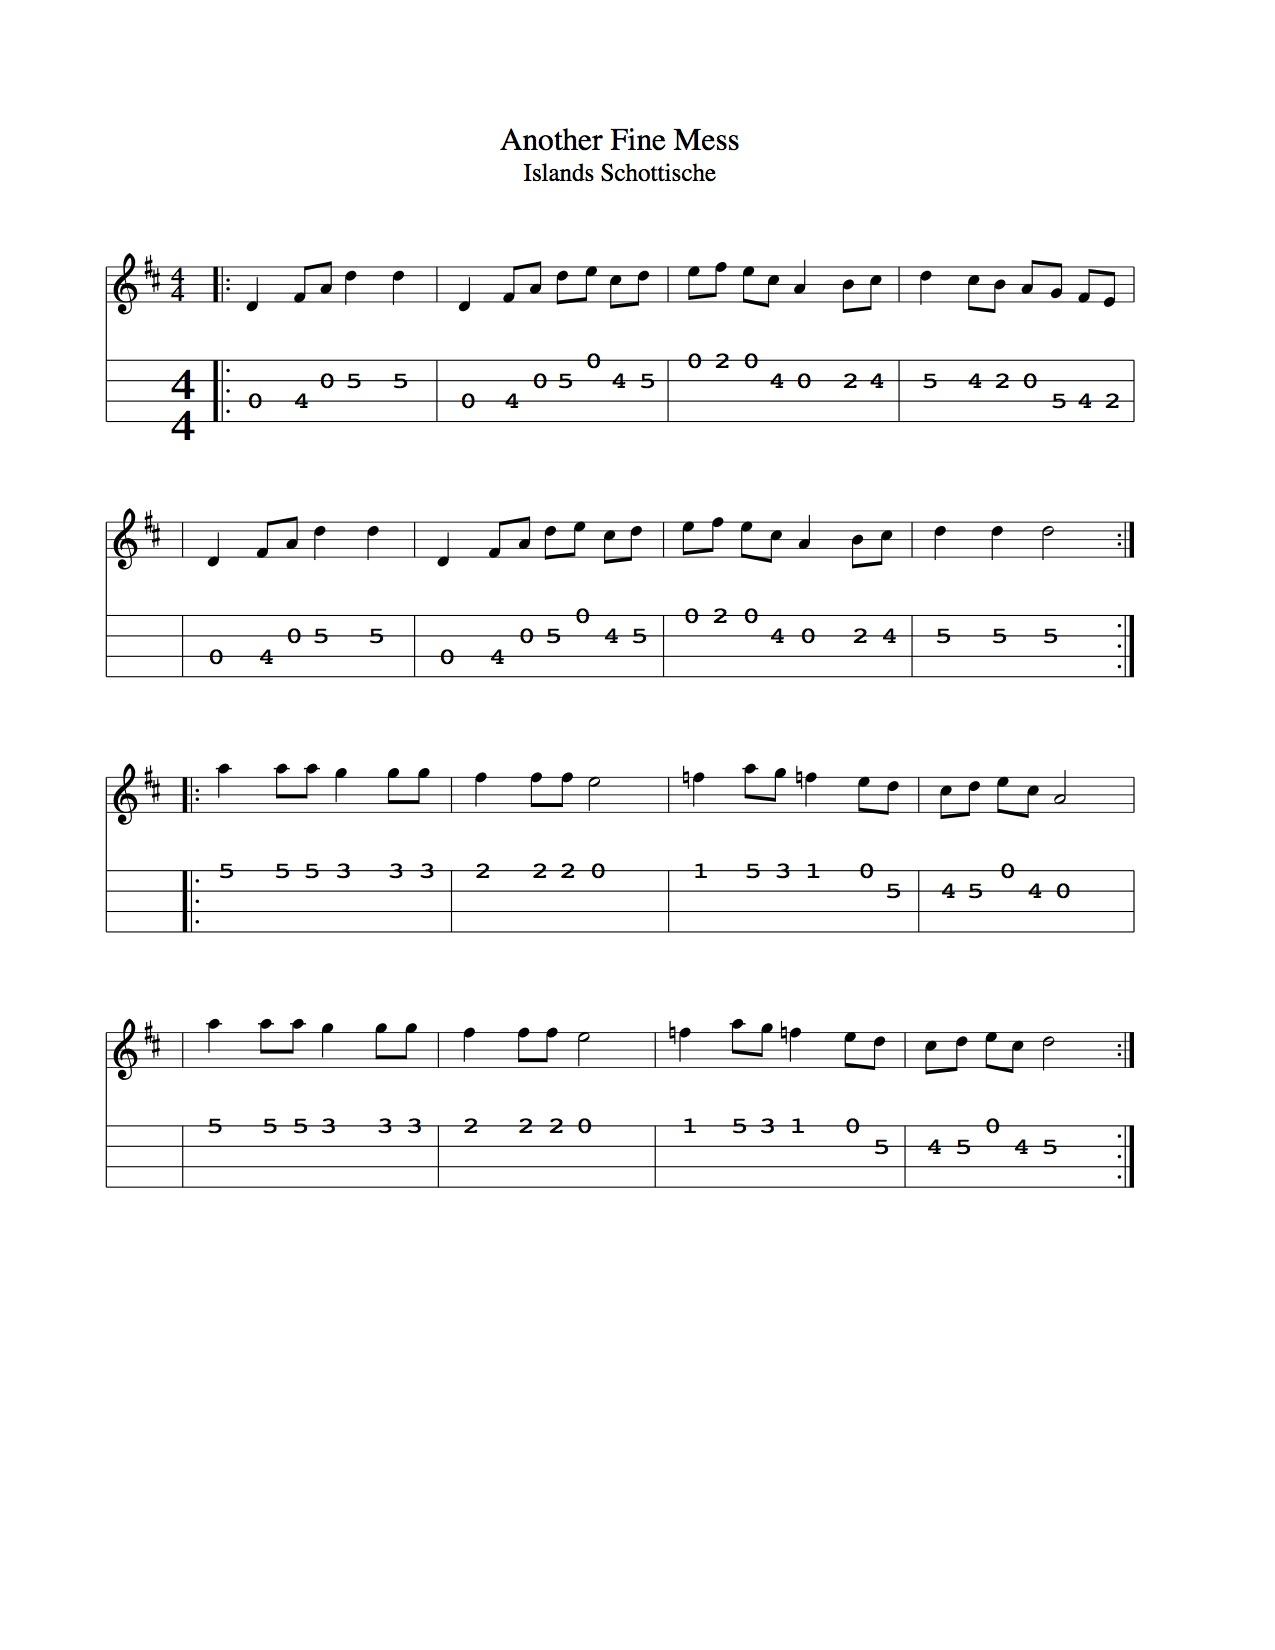 Mandolin Tabs Related Keywords u0026 Suggestions - Mandolin Tabs Long Tail Keywords